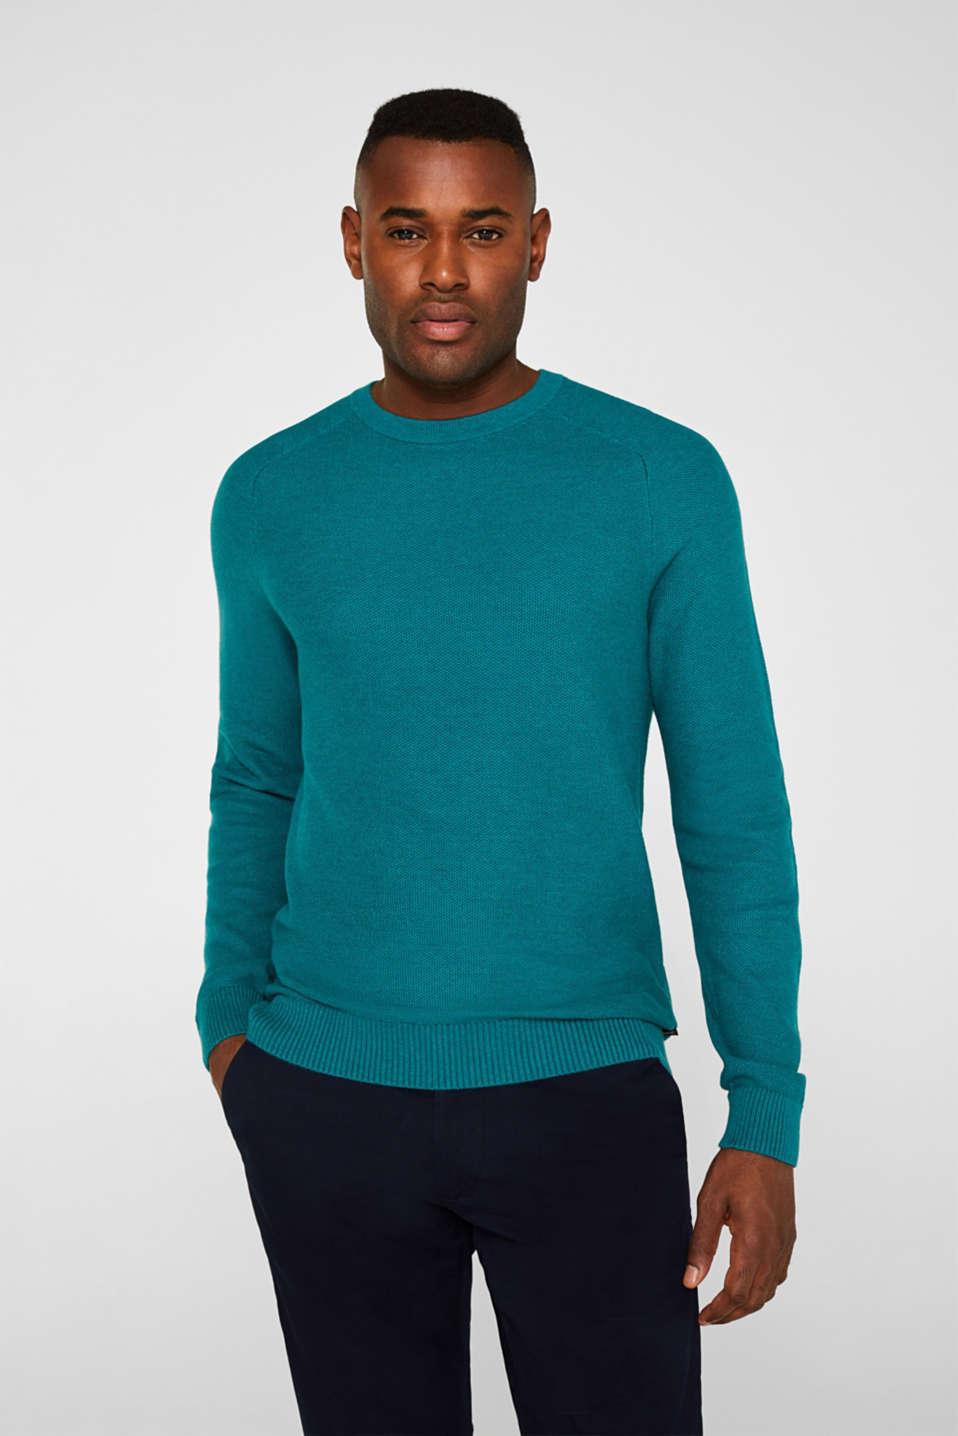 Textured jumper made of 100% cotton, TEAL BLUE 5, detail image number 0